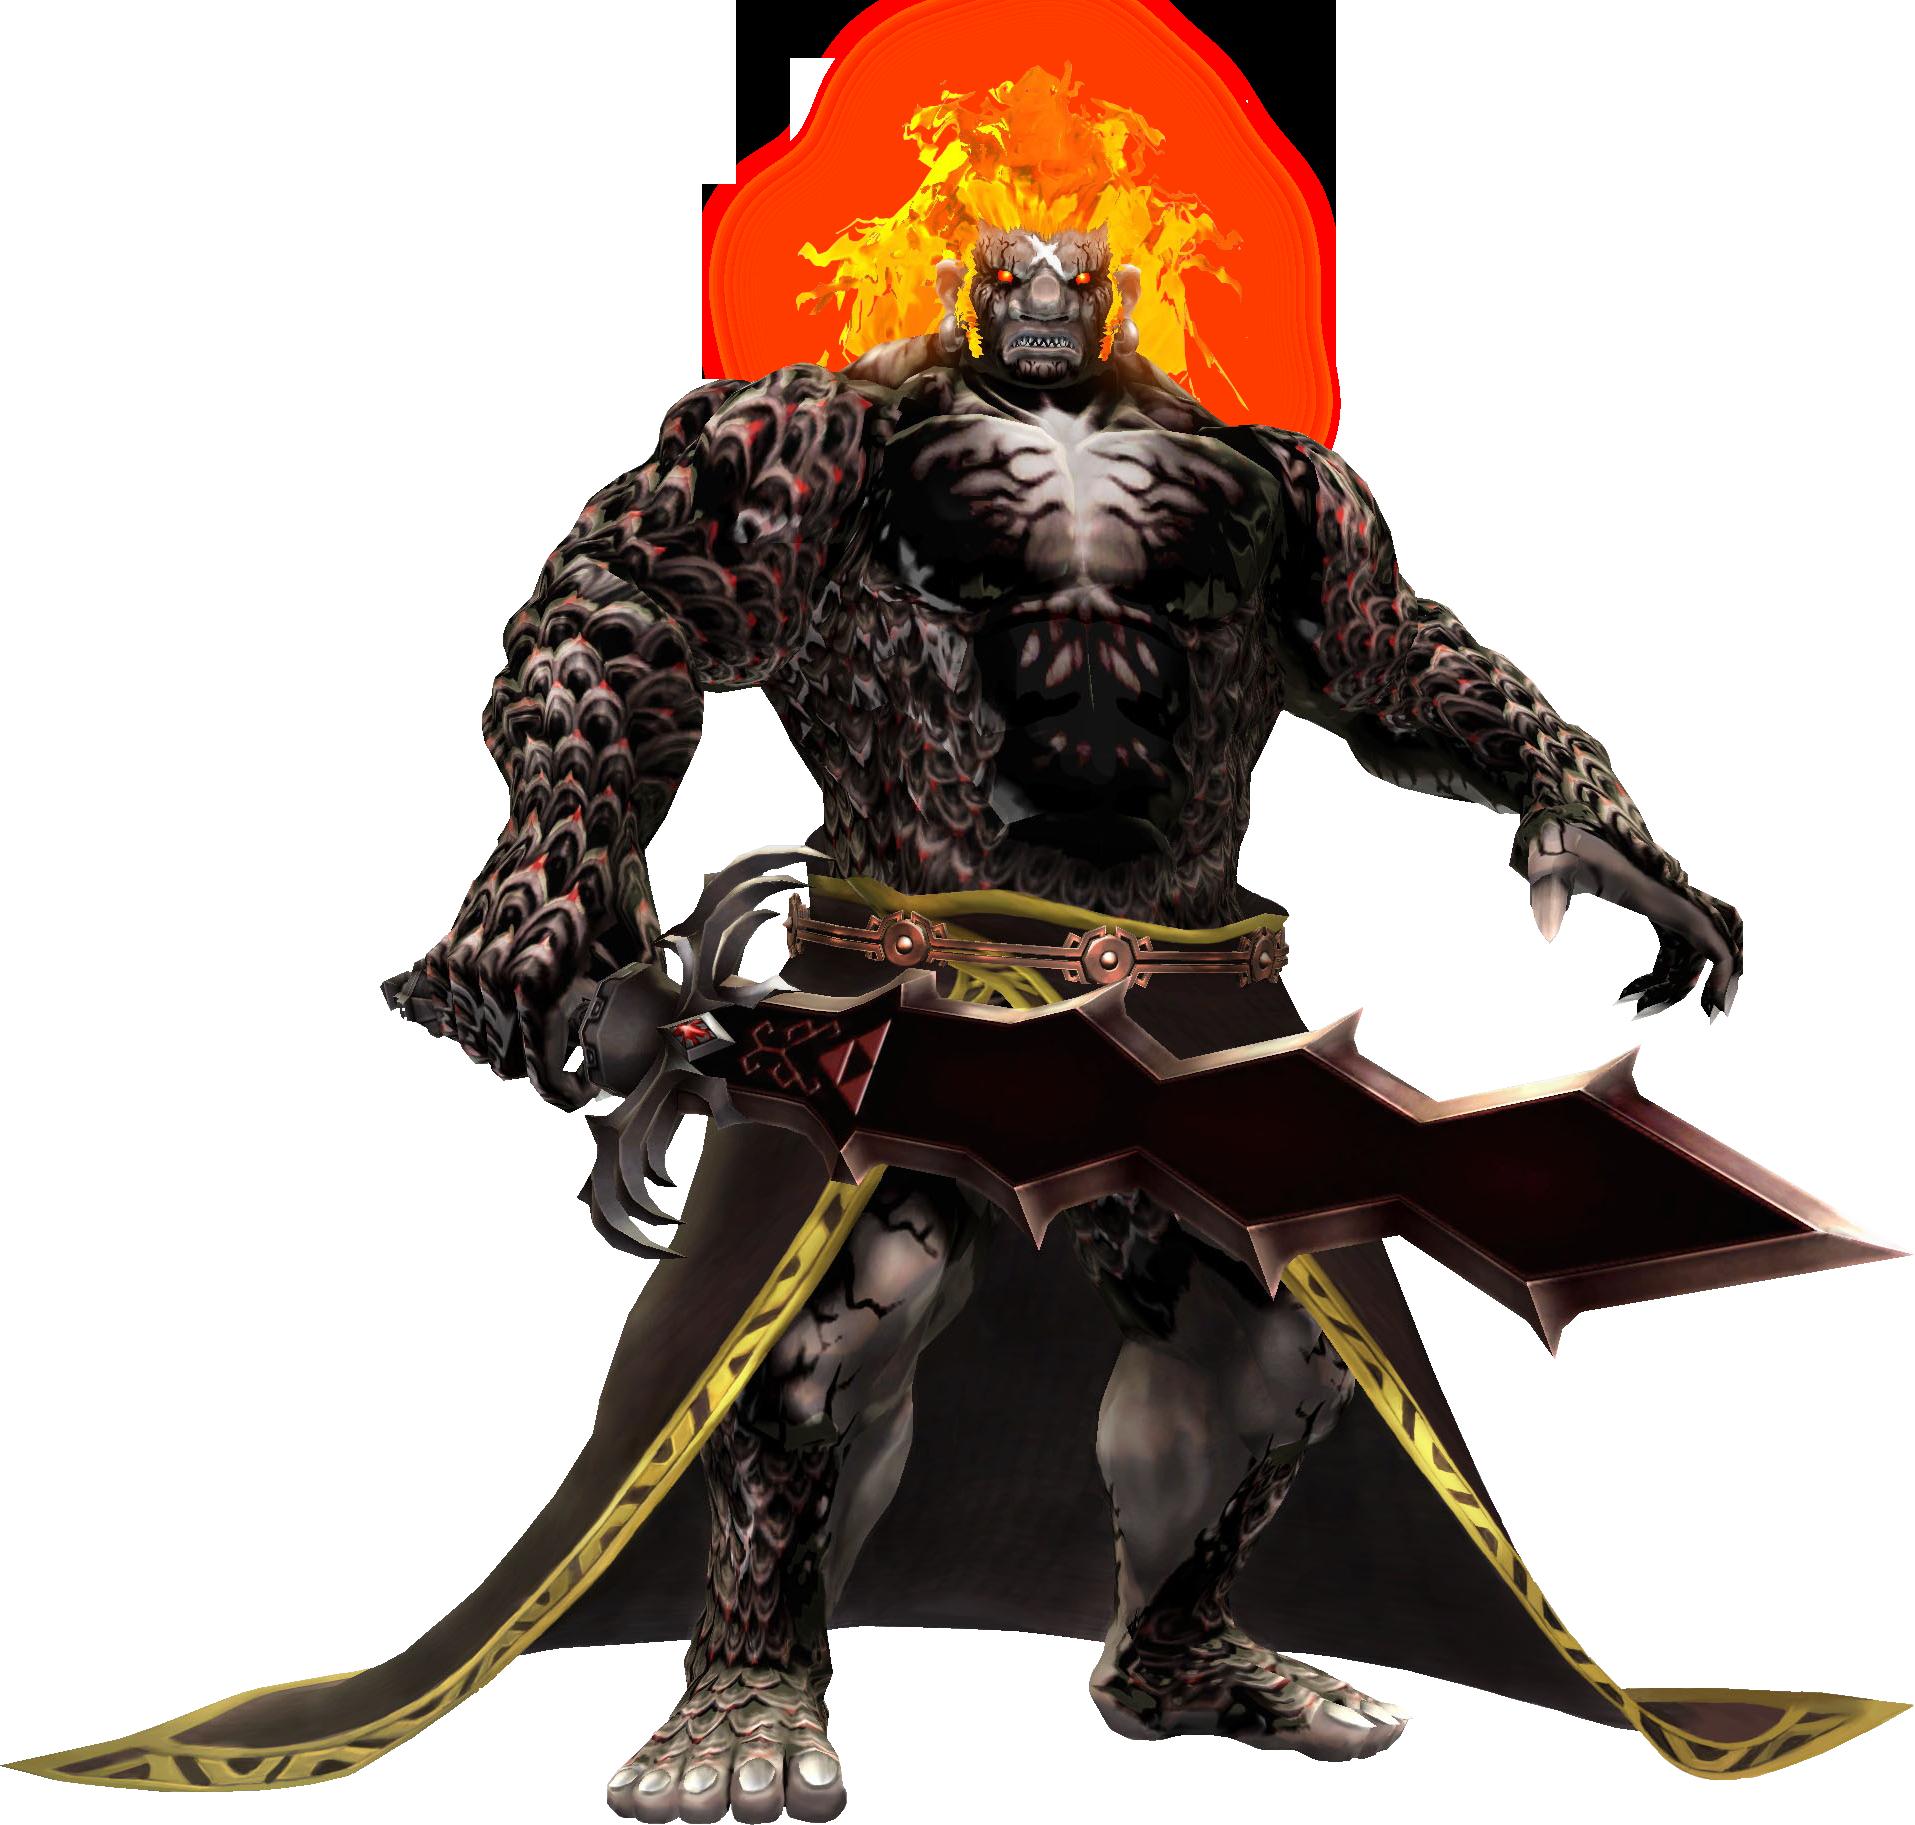 [adelanto!]SUPERMEGASPOILER!!!!jefe final skyward sword Demise-Medium